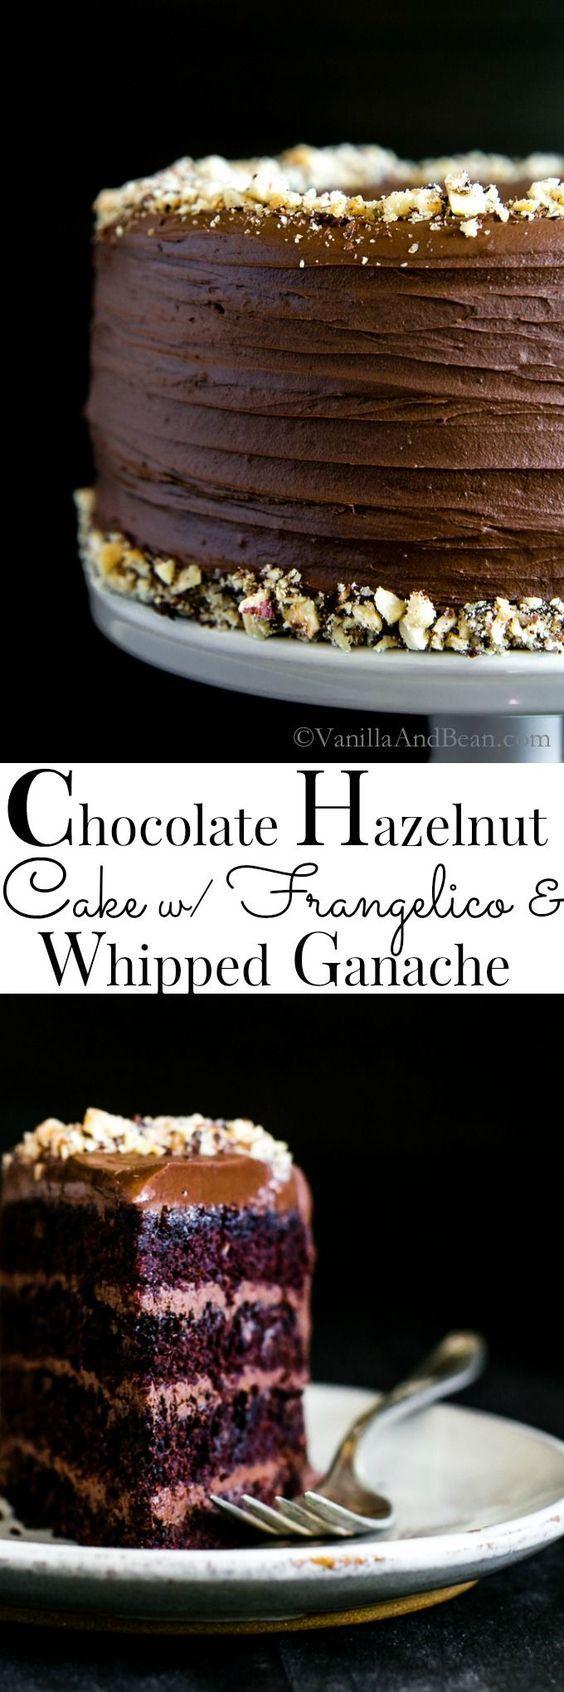 57 Best Vegan Recipes My Sweet Inspiration Images On Pinterest Aaist Whole Hazelnut Milk Chocolate 100 Gram Cake With Whipped Ganache Egg Free Dairy Vanilla And Bean